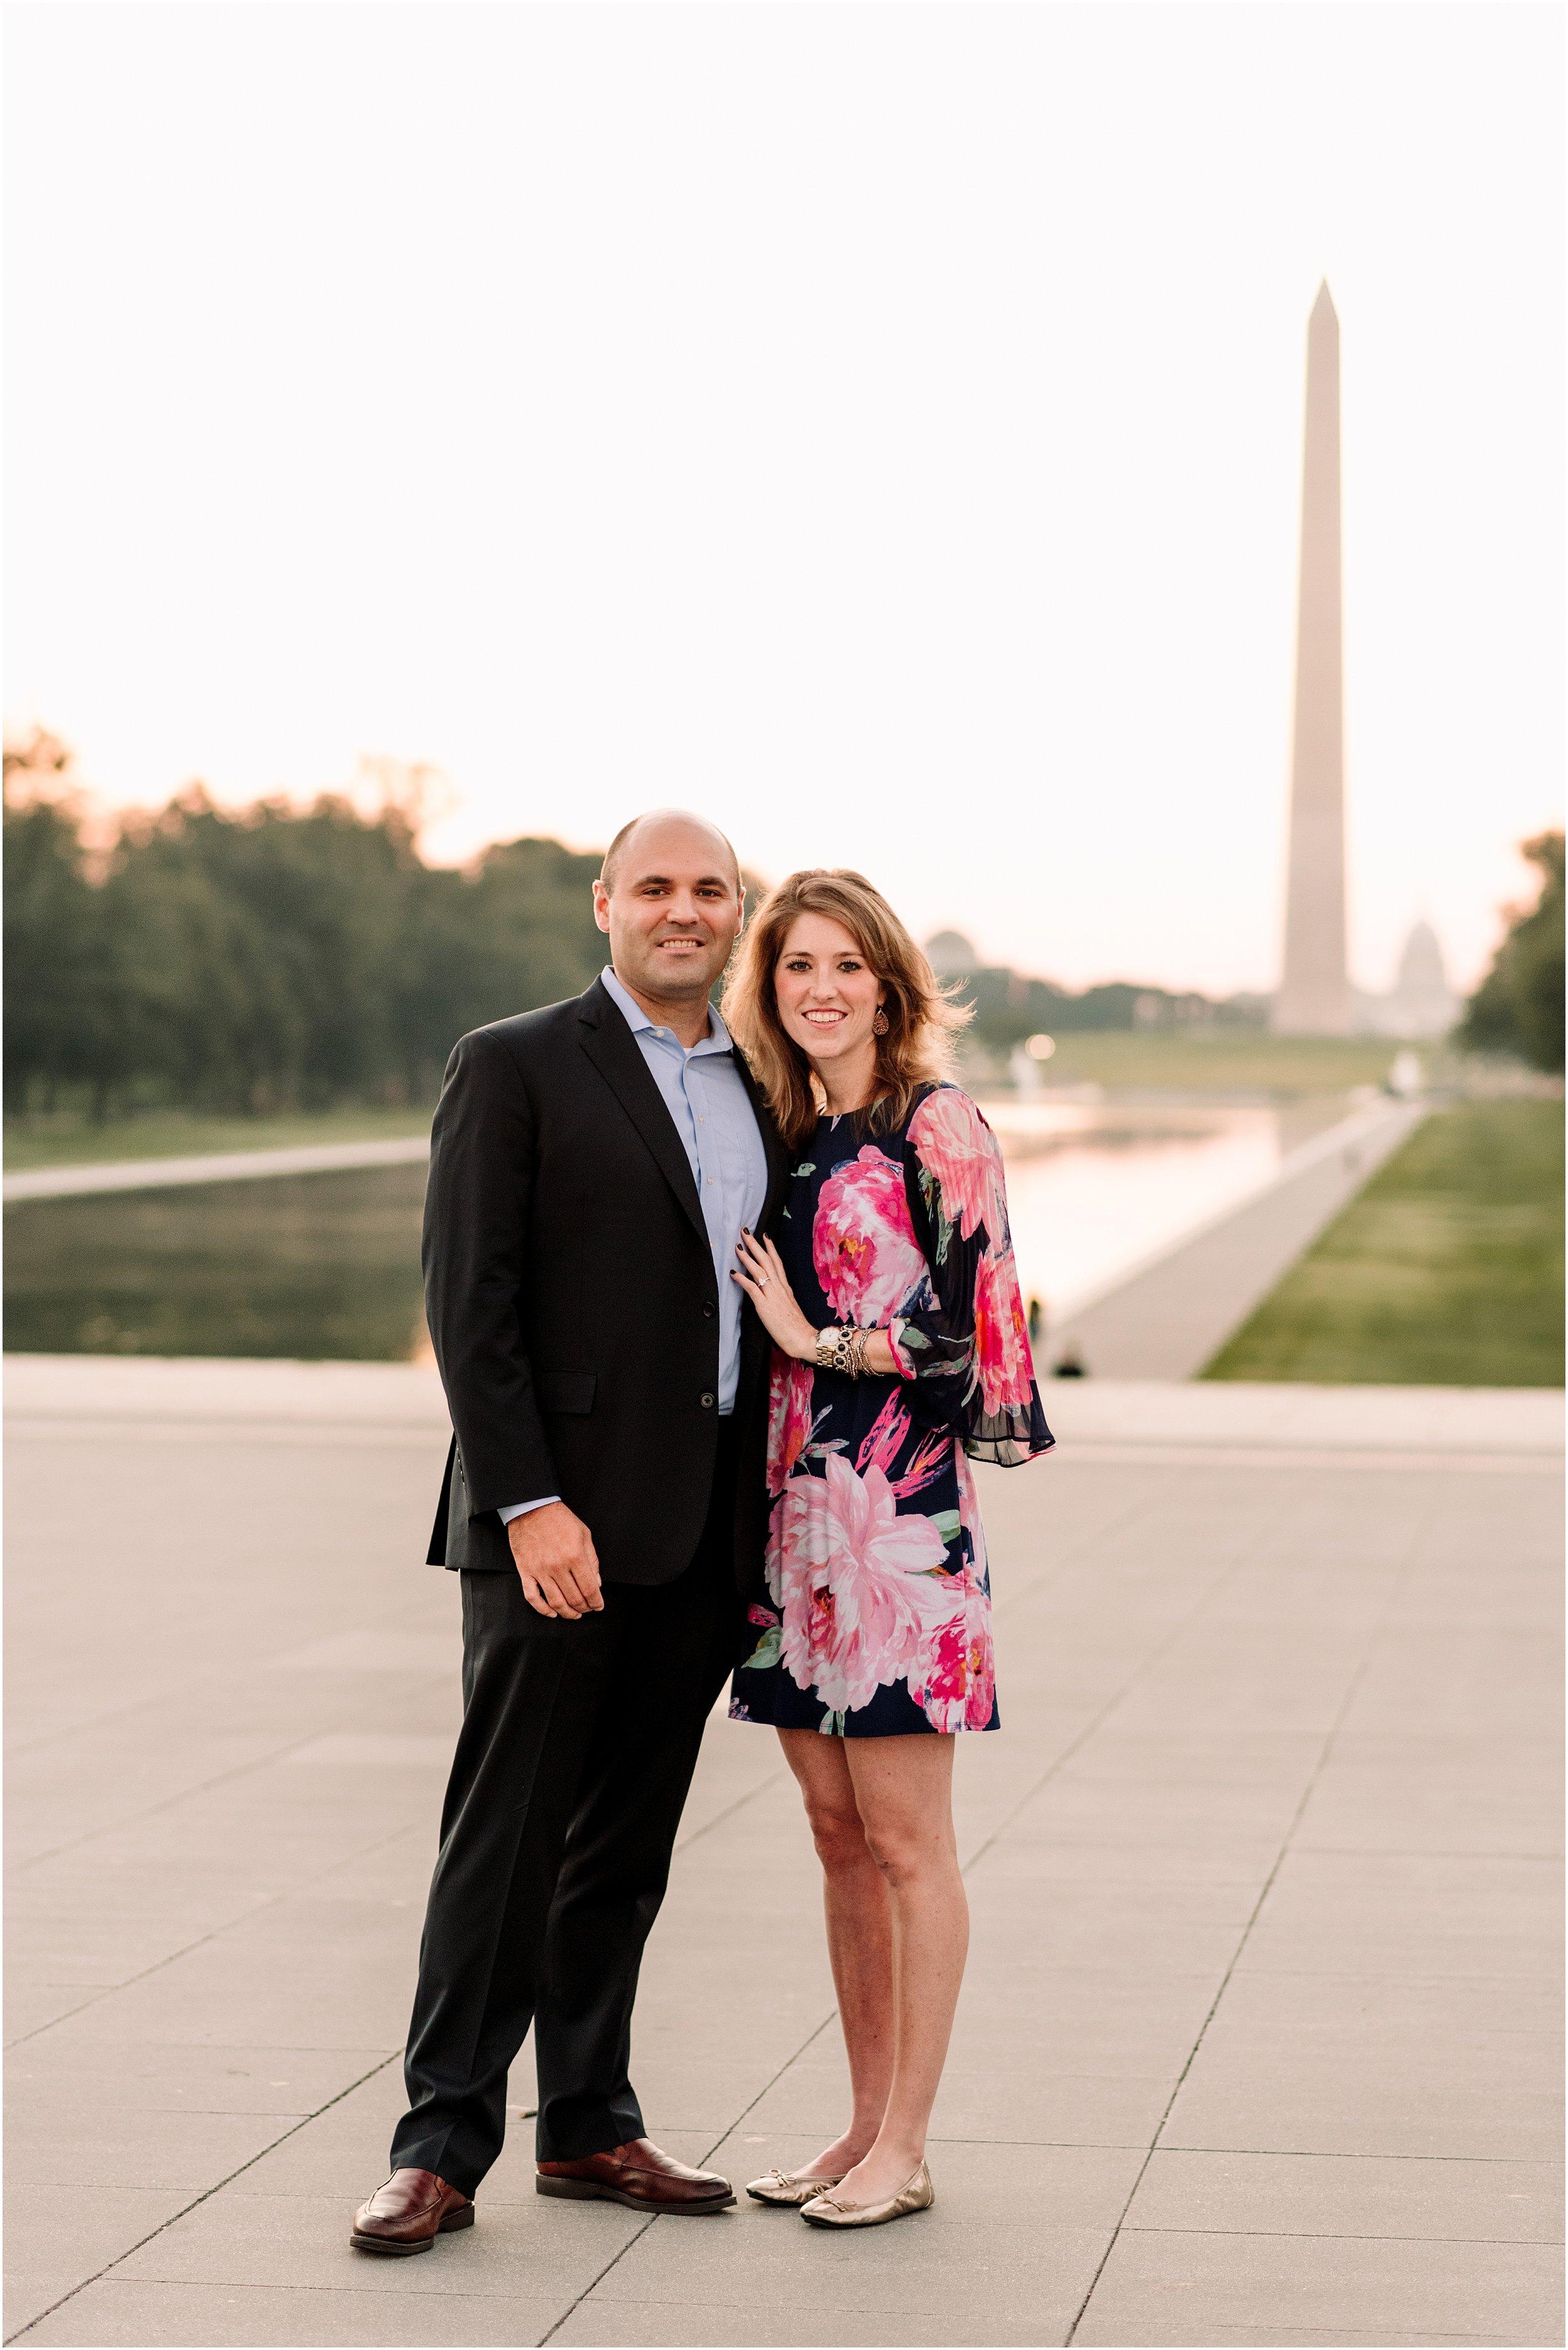 hannah leigh photography Sunrise Jefferson Memorial Engagement Session, Washington DC_1017.jpg